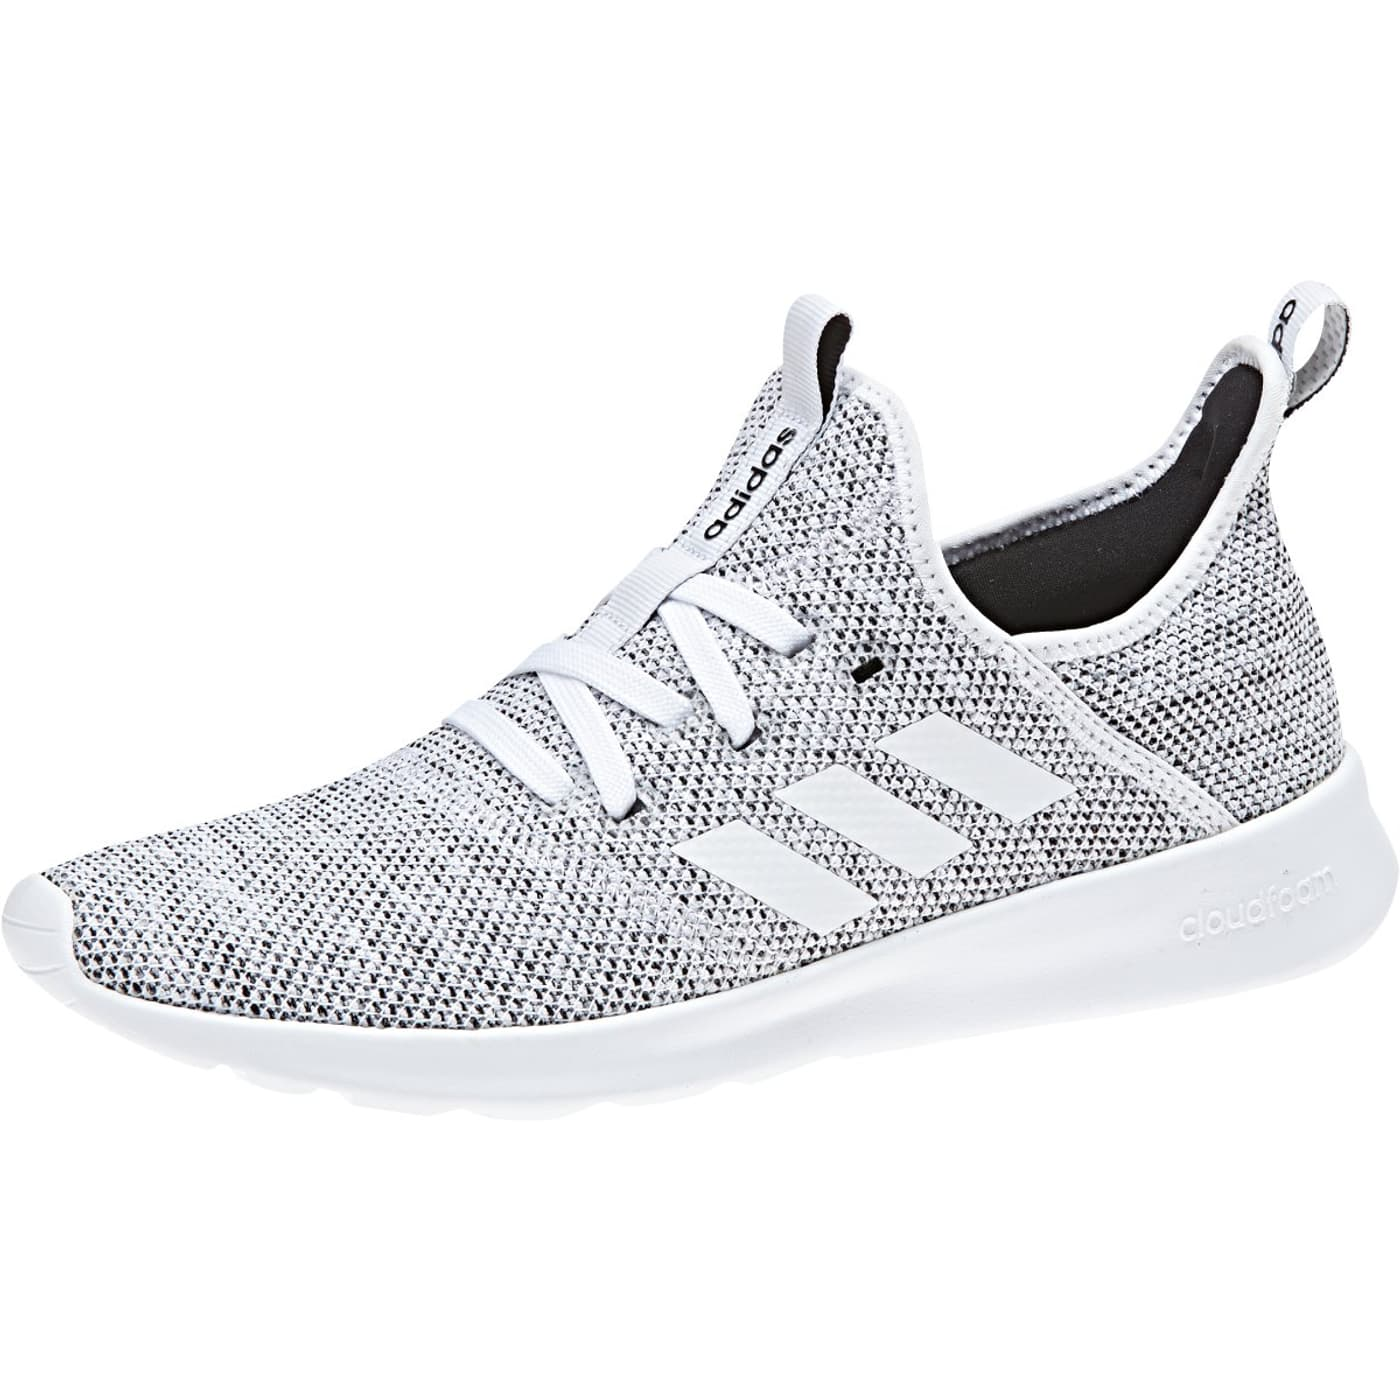 889471cf8c705 Adidas loisirs Cloudfoam Pure Chaussures de loisirs Adidas pour femme Migros  b23844